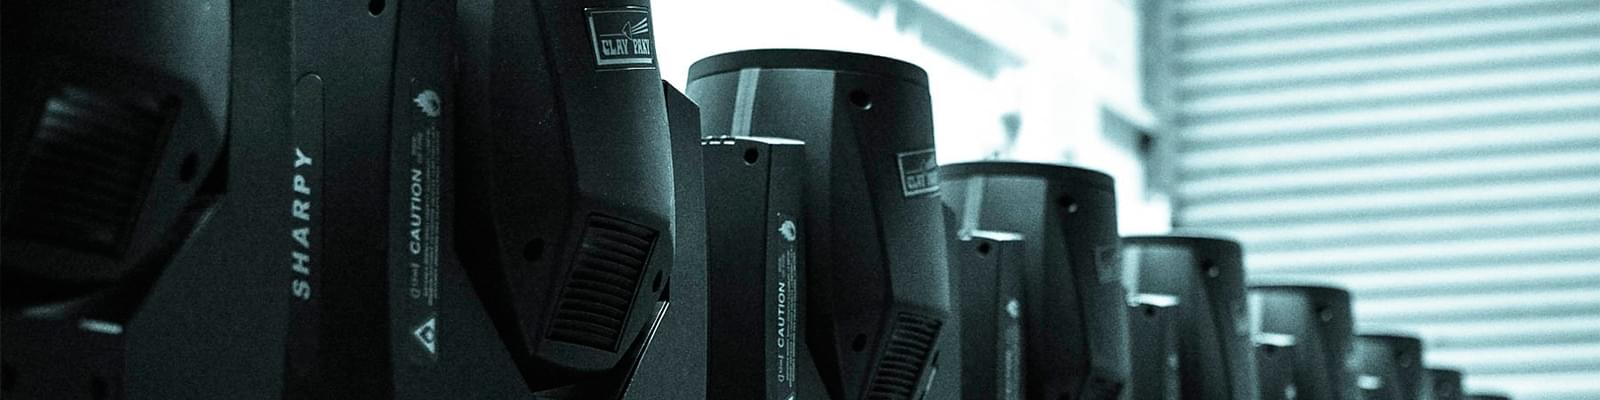 projector-3